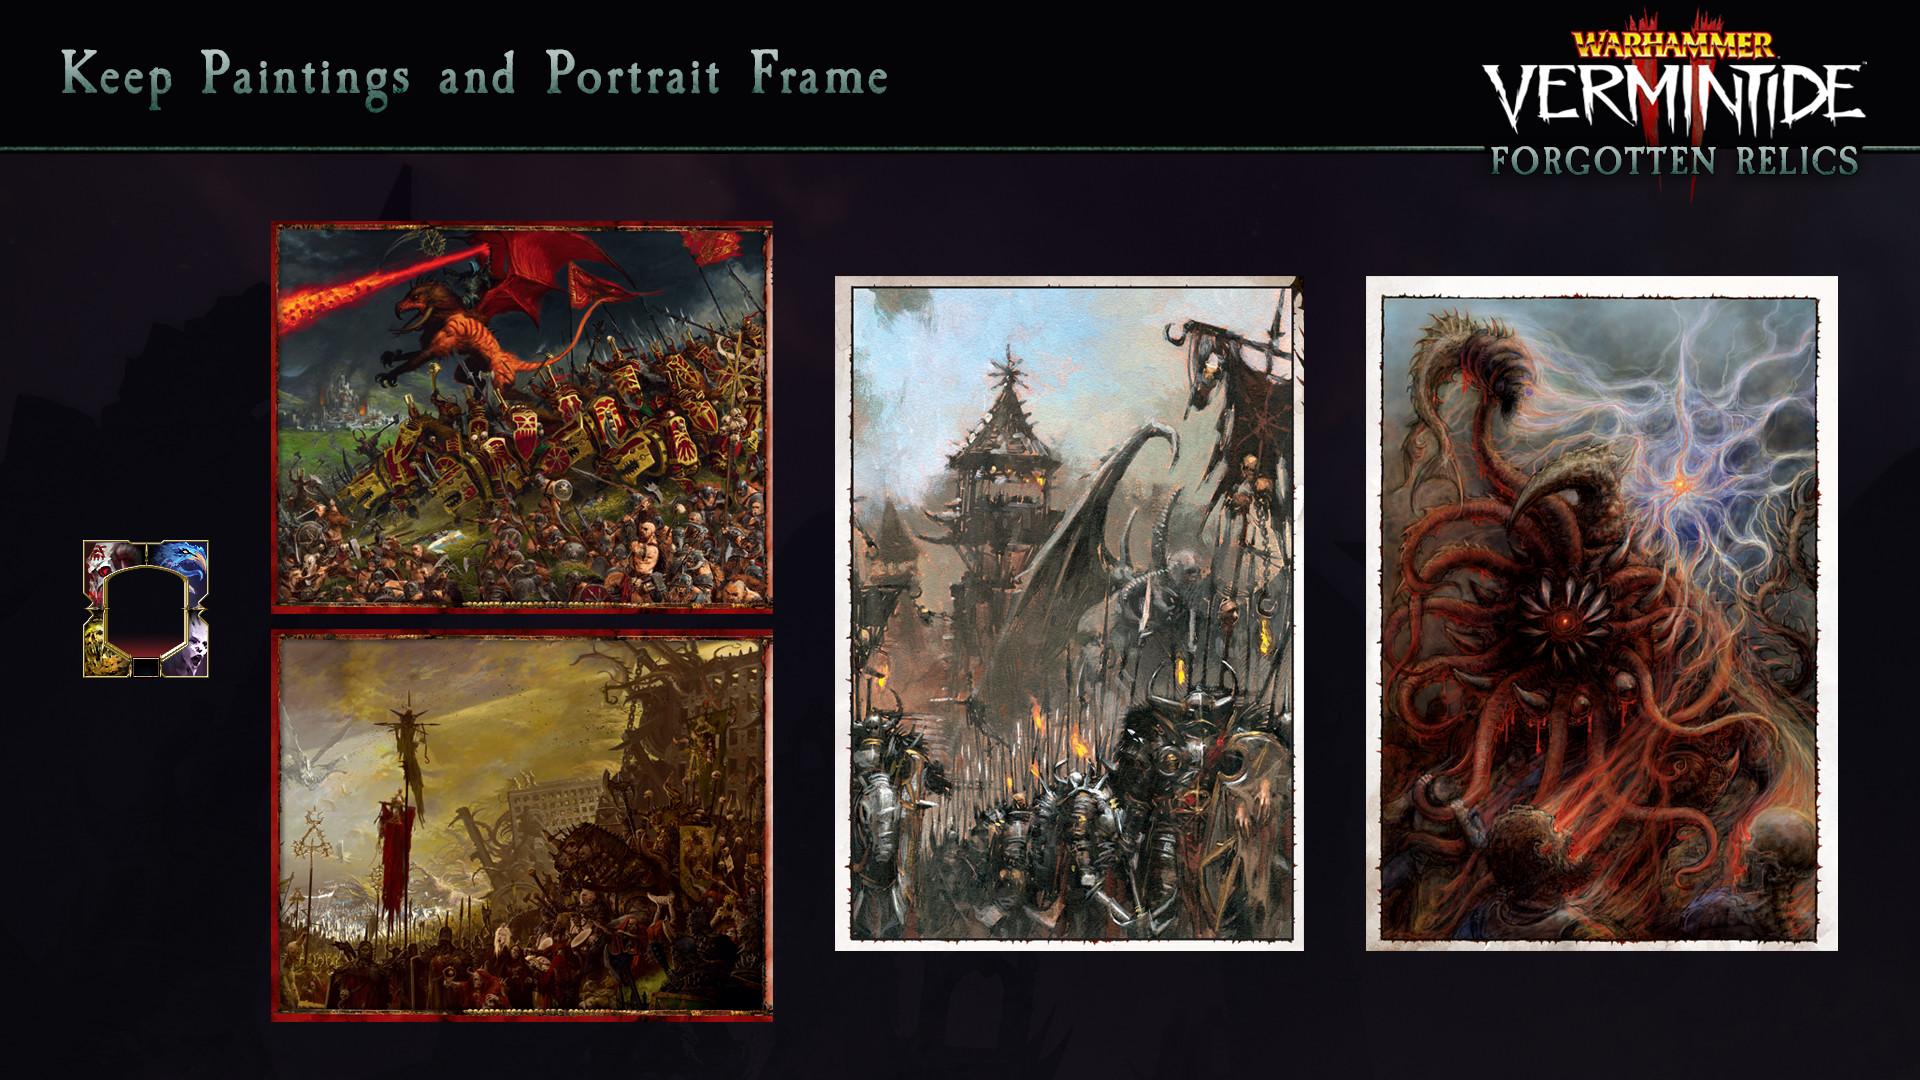 Warhammer: Vermintide 2 - Forgotten Relics Pack